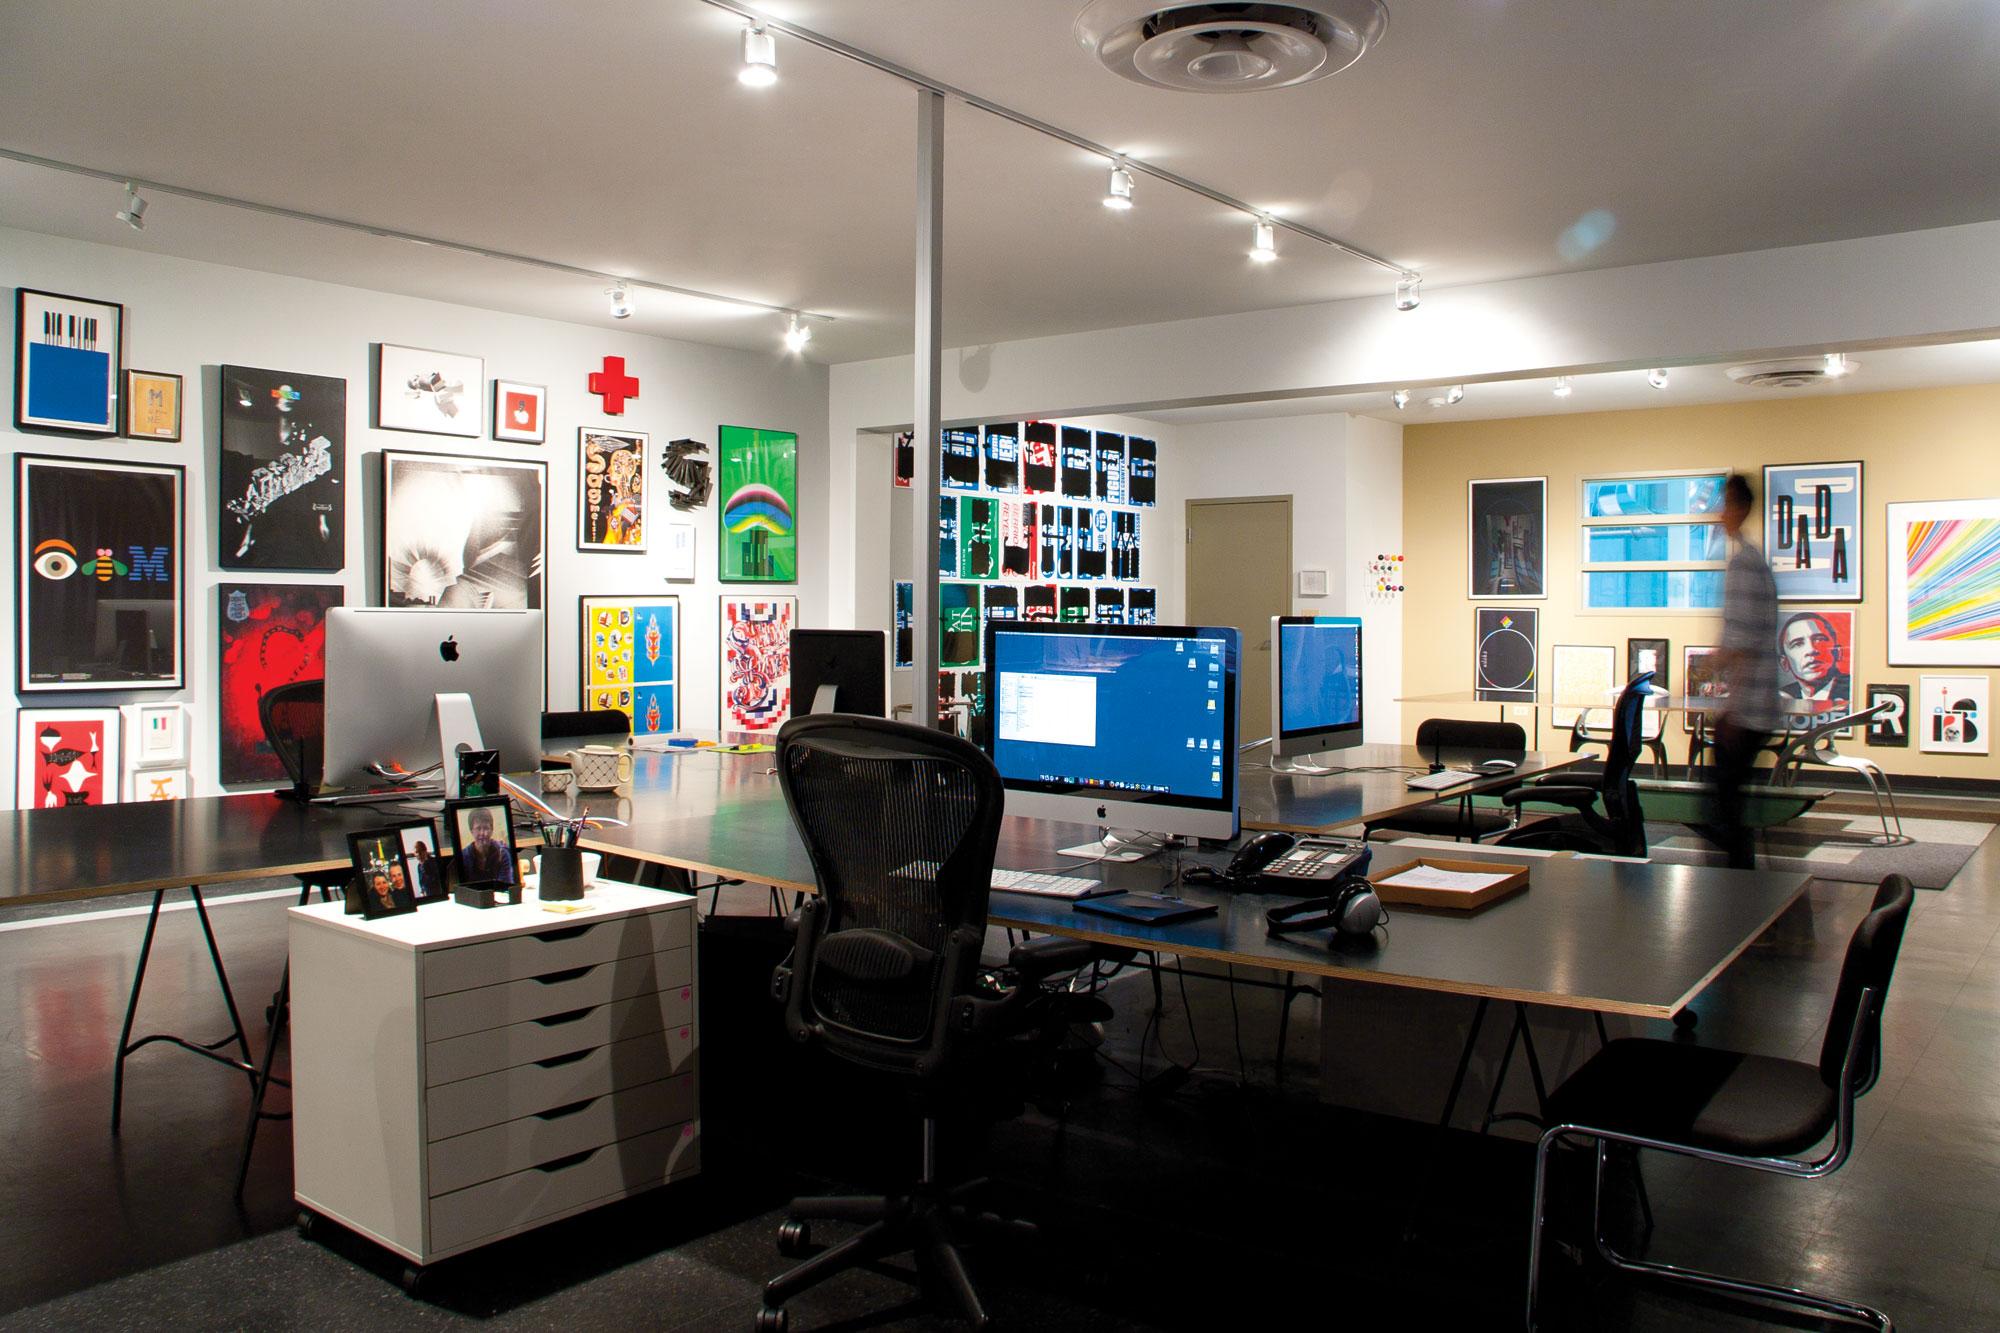 3st-OfficeShots-2012-1048-RT-Flat-Web.jpg